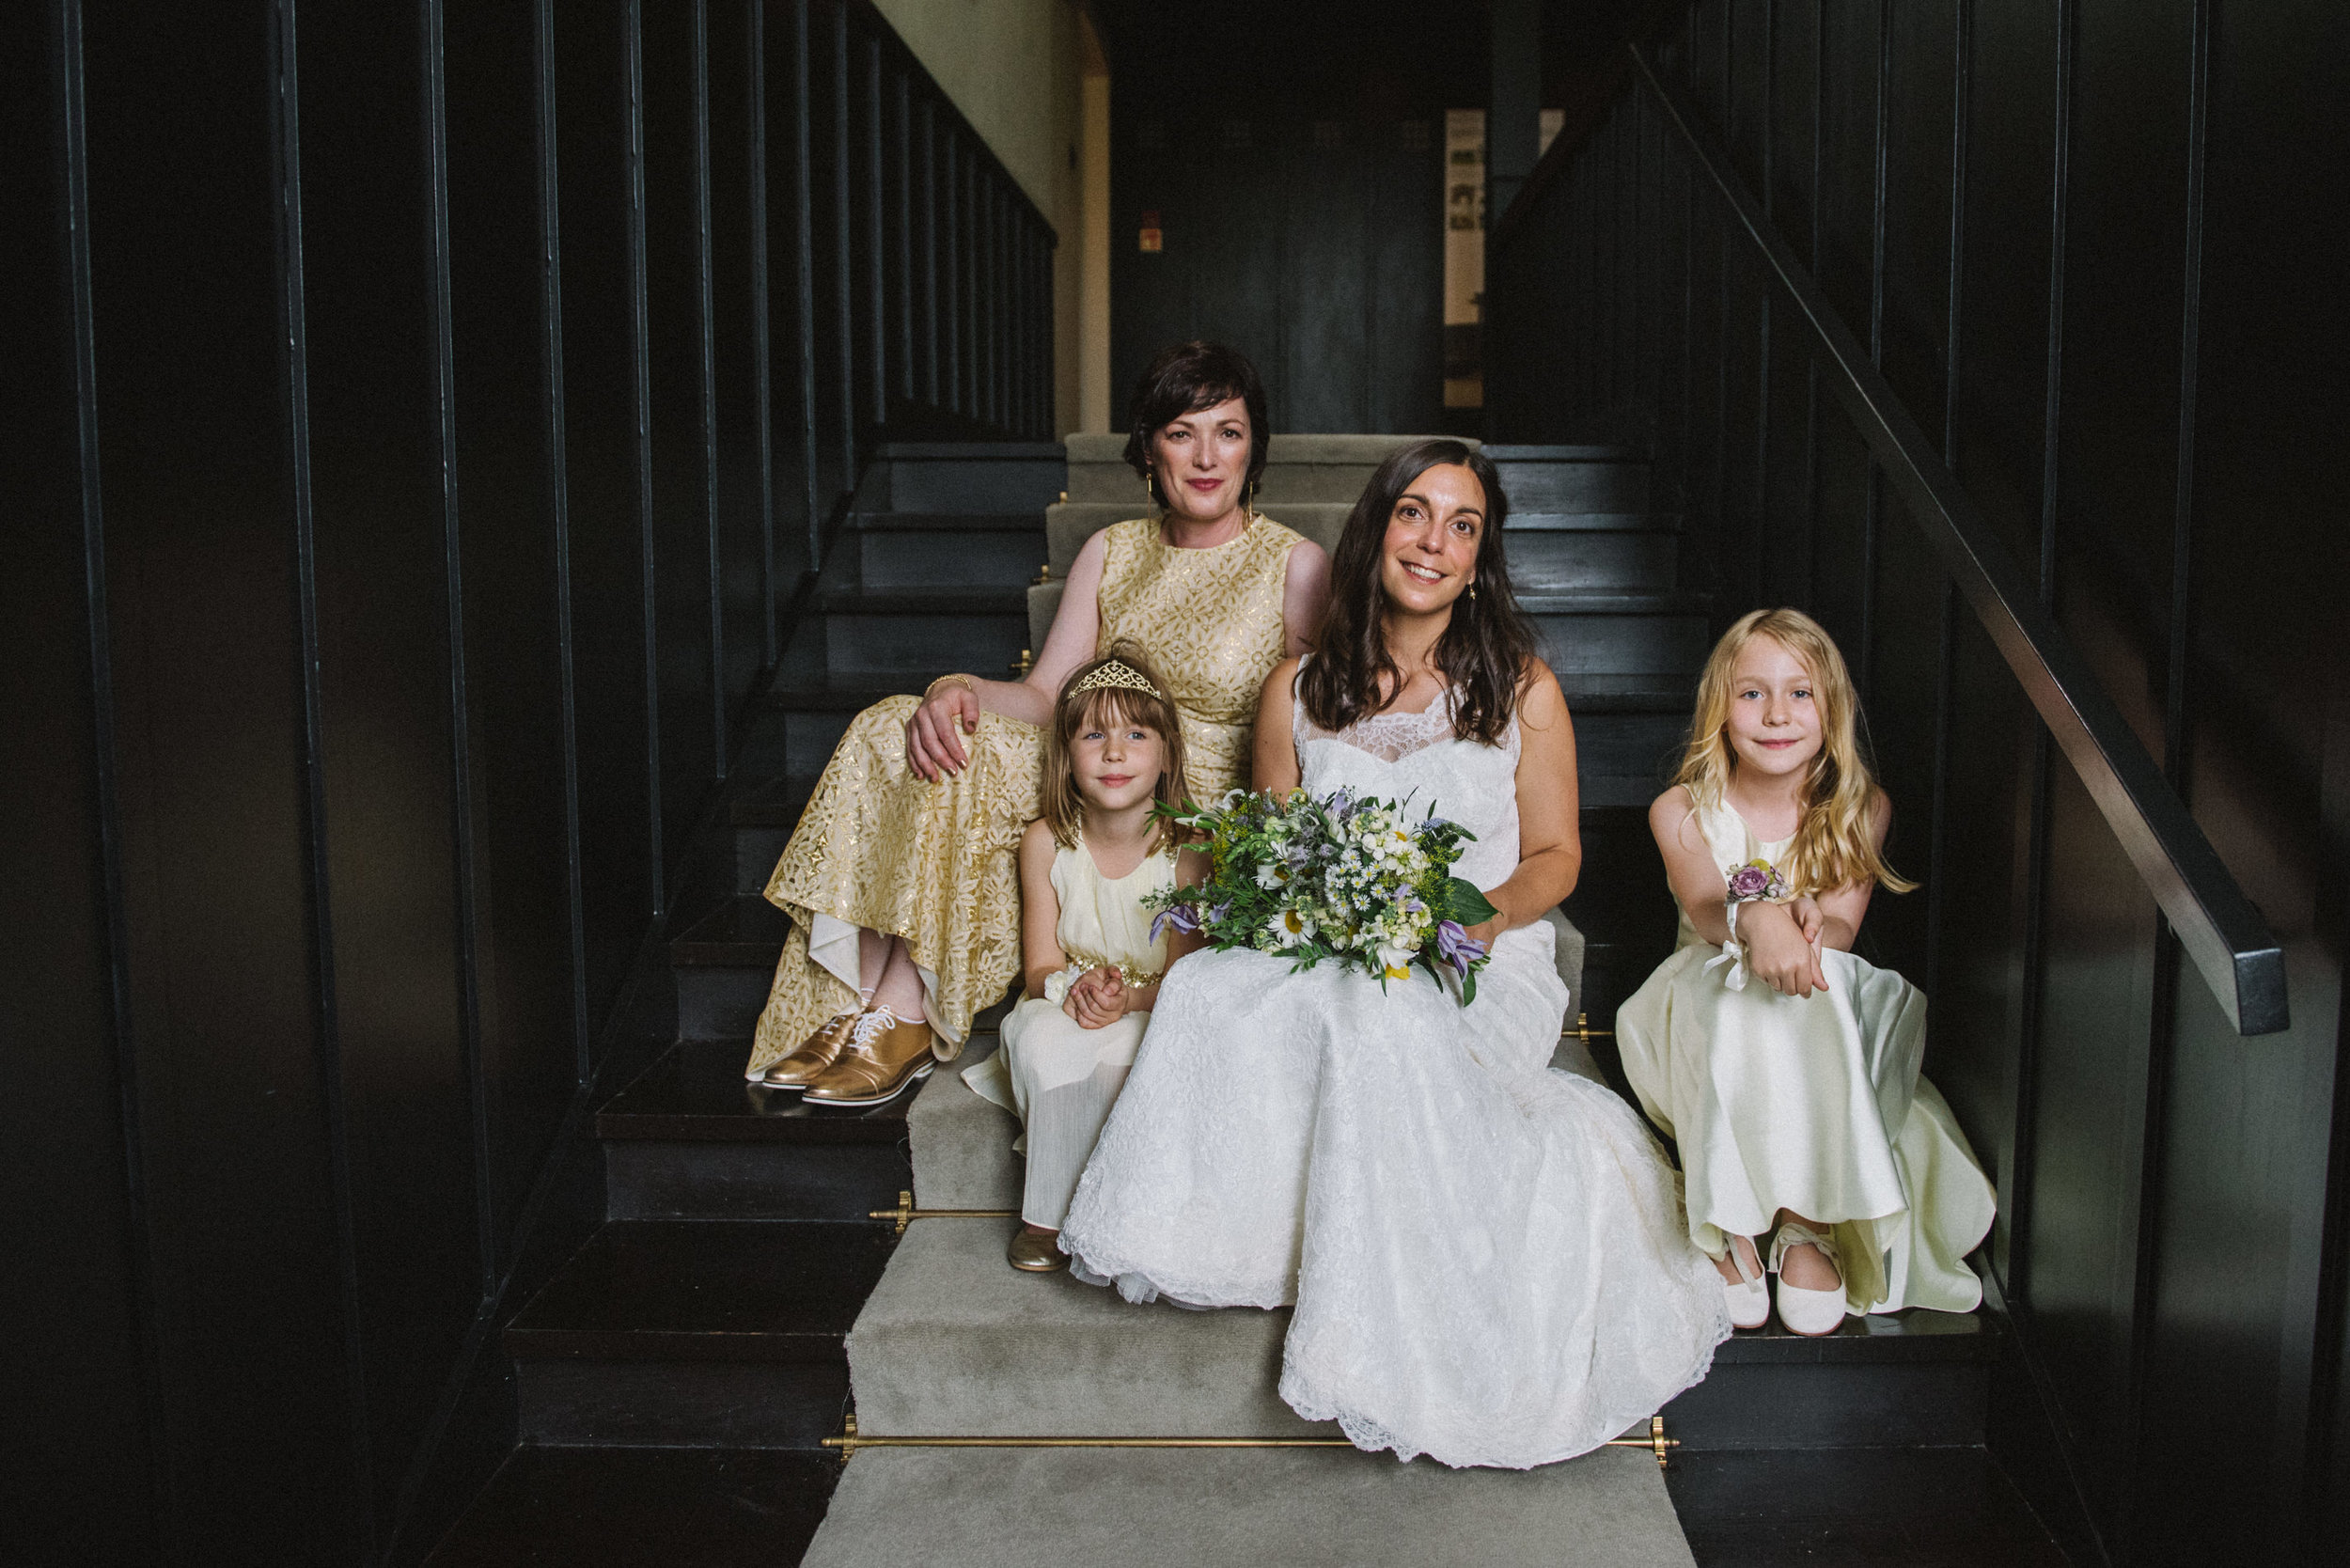 0120-LISA-DEVINE-PHOTOGRAPHY-ALTERNATIVE-WEDDING-PHOTOGRAPHY-SCOTLAND-DESTINATION-WEDDINGS-GLASGOW-WEDDINGS-COOL-WEDDINGS-STYLISH-WEDDINGS.JPG